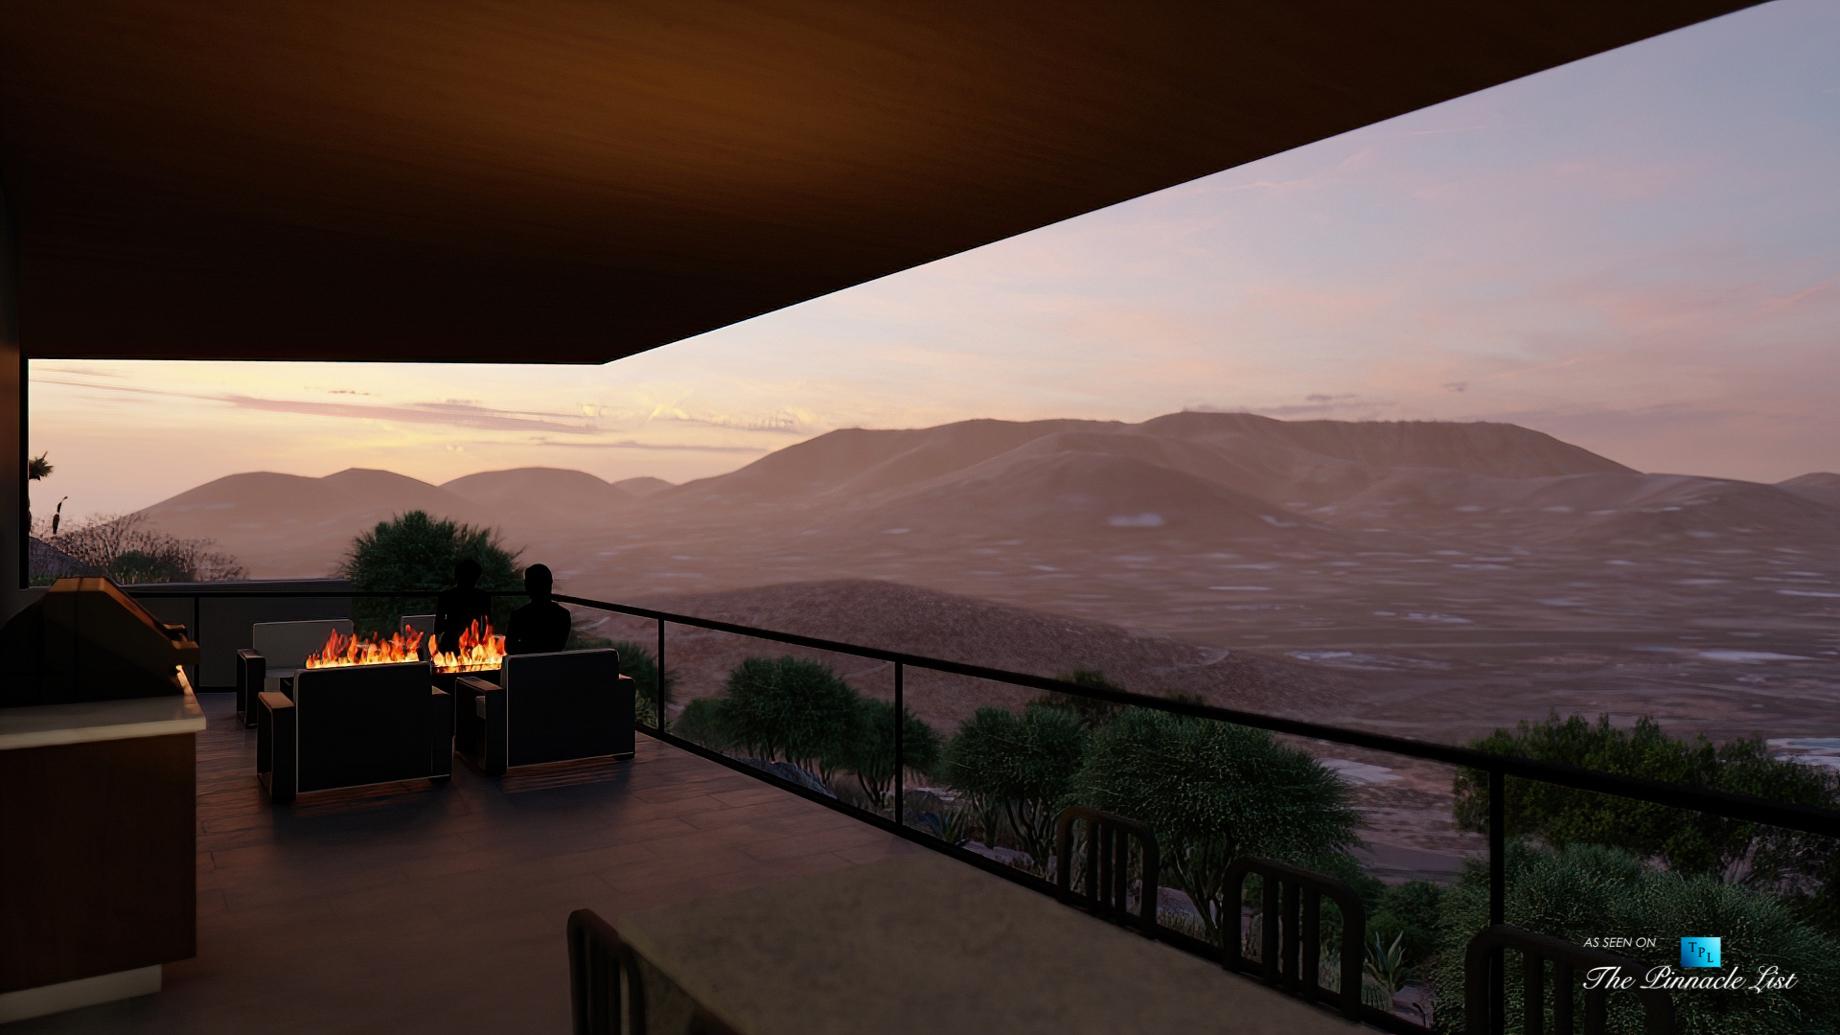 Mummy Mountain Luxury Residence - 5221 E Cheney Dr, Paradise Valley, AZ, USA - Deck Night View